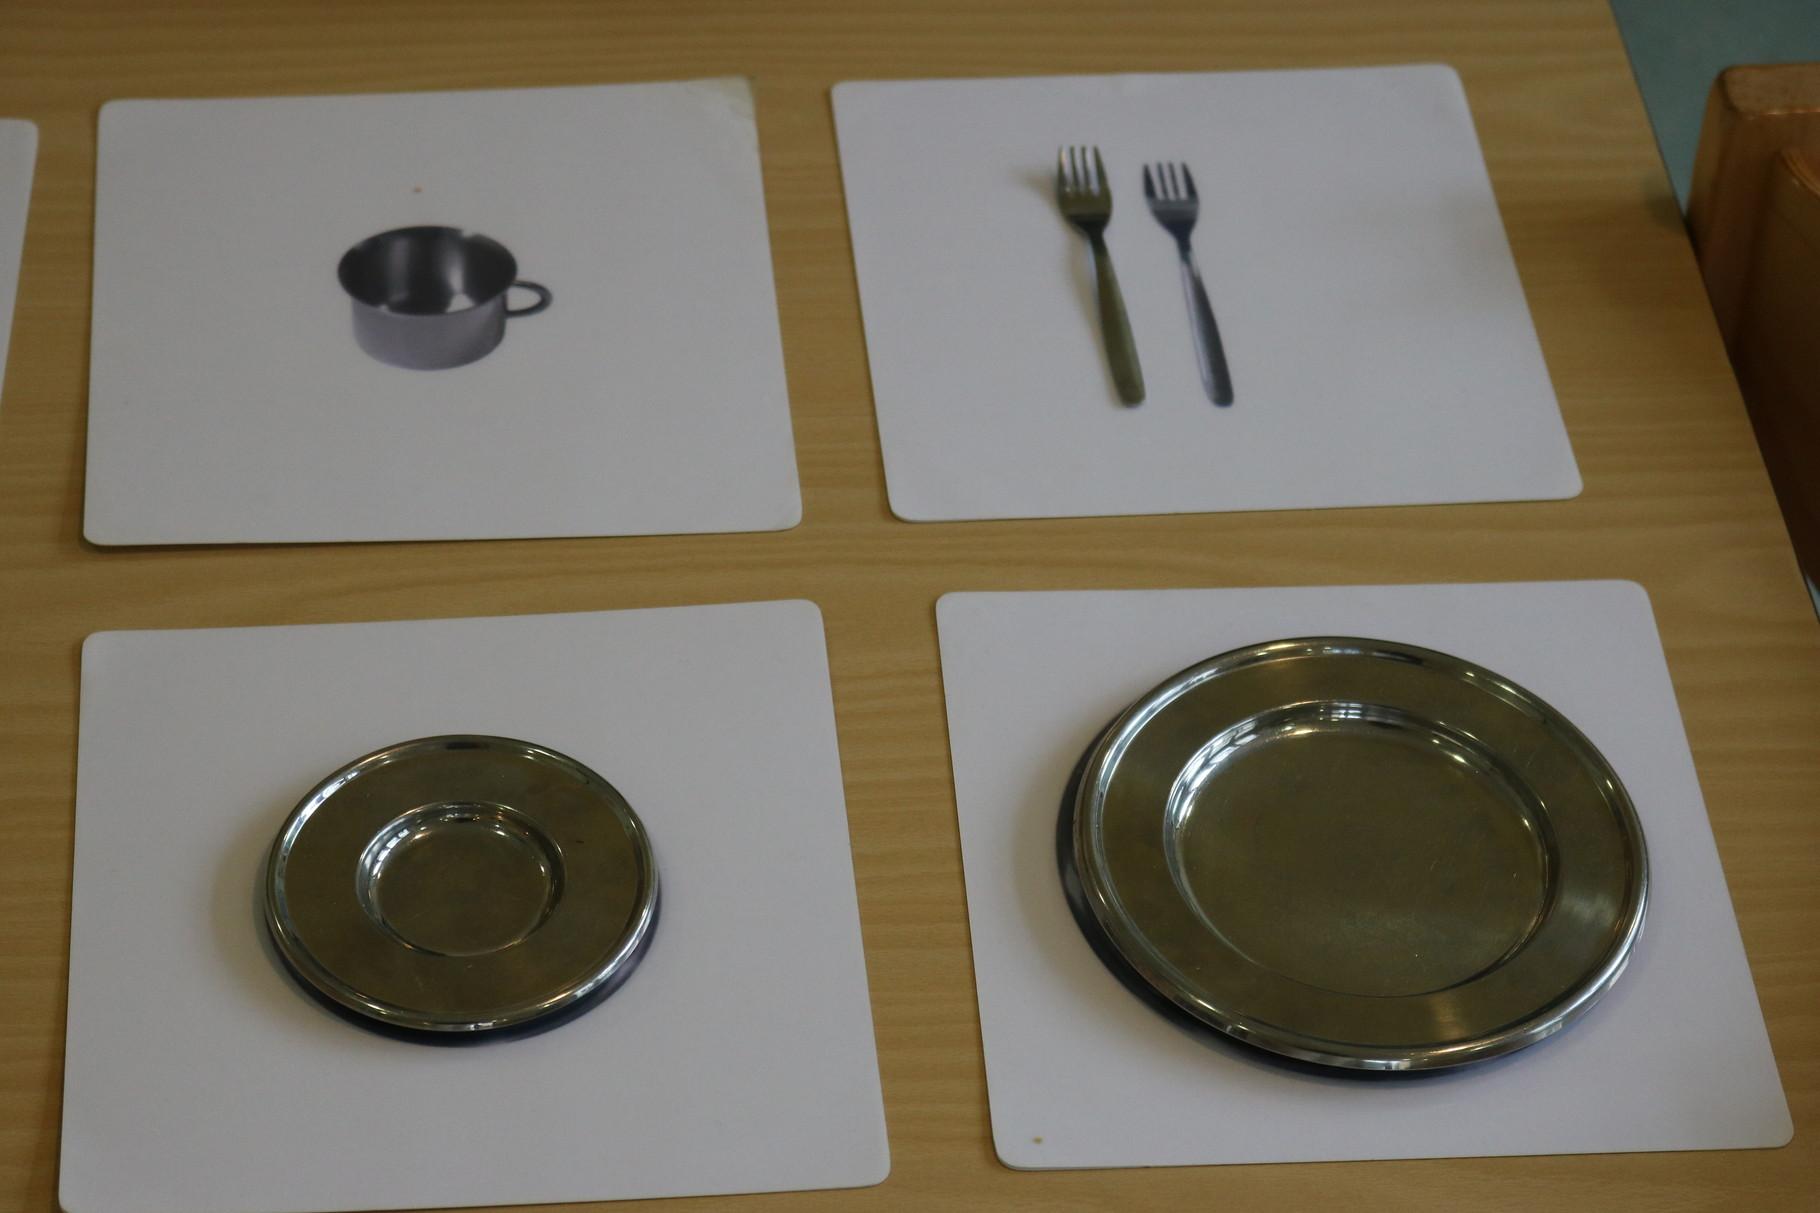 Montessori Material U 3